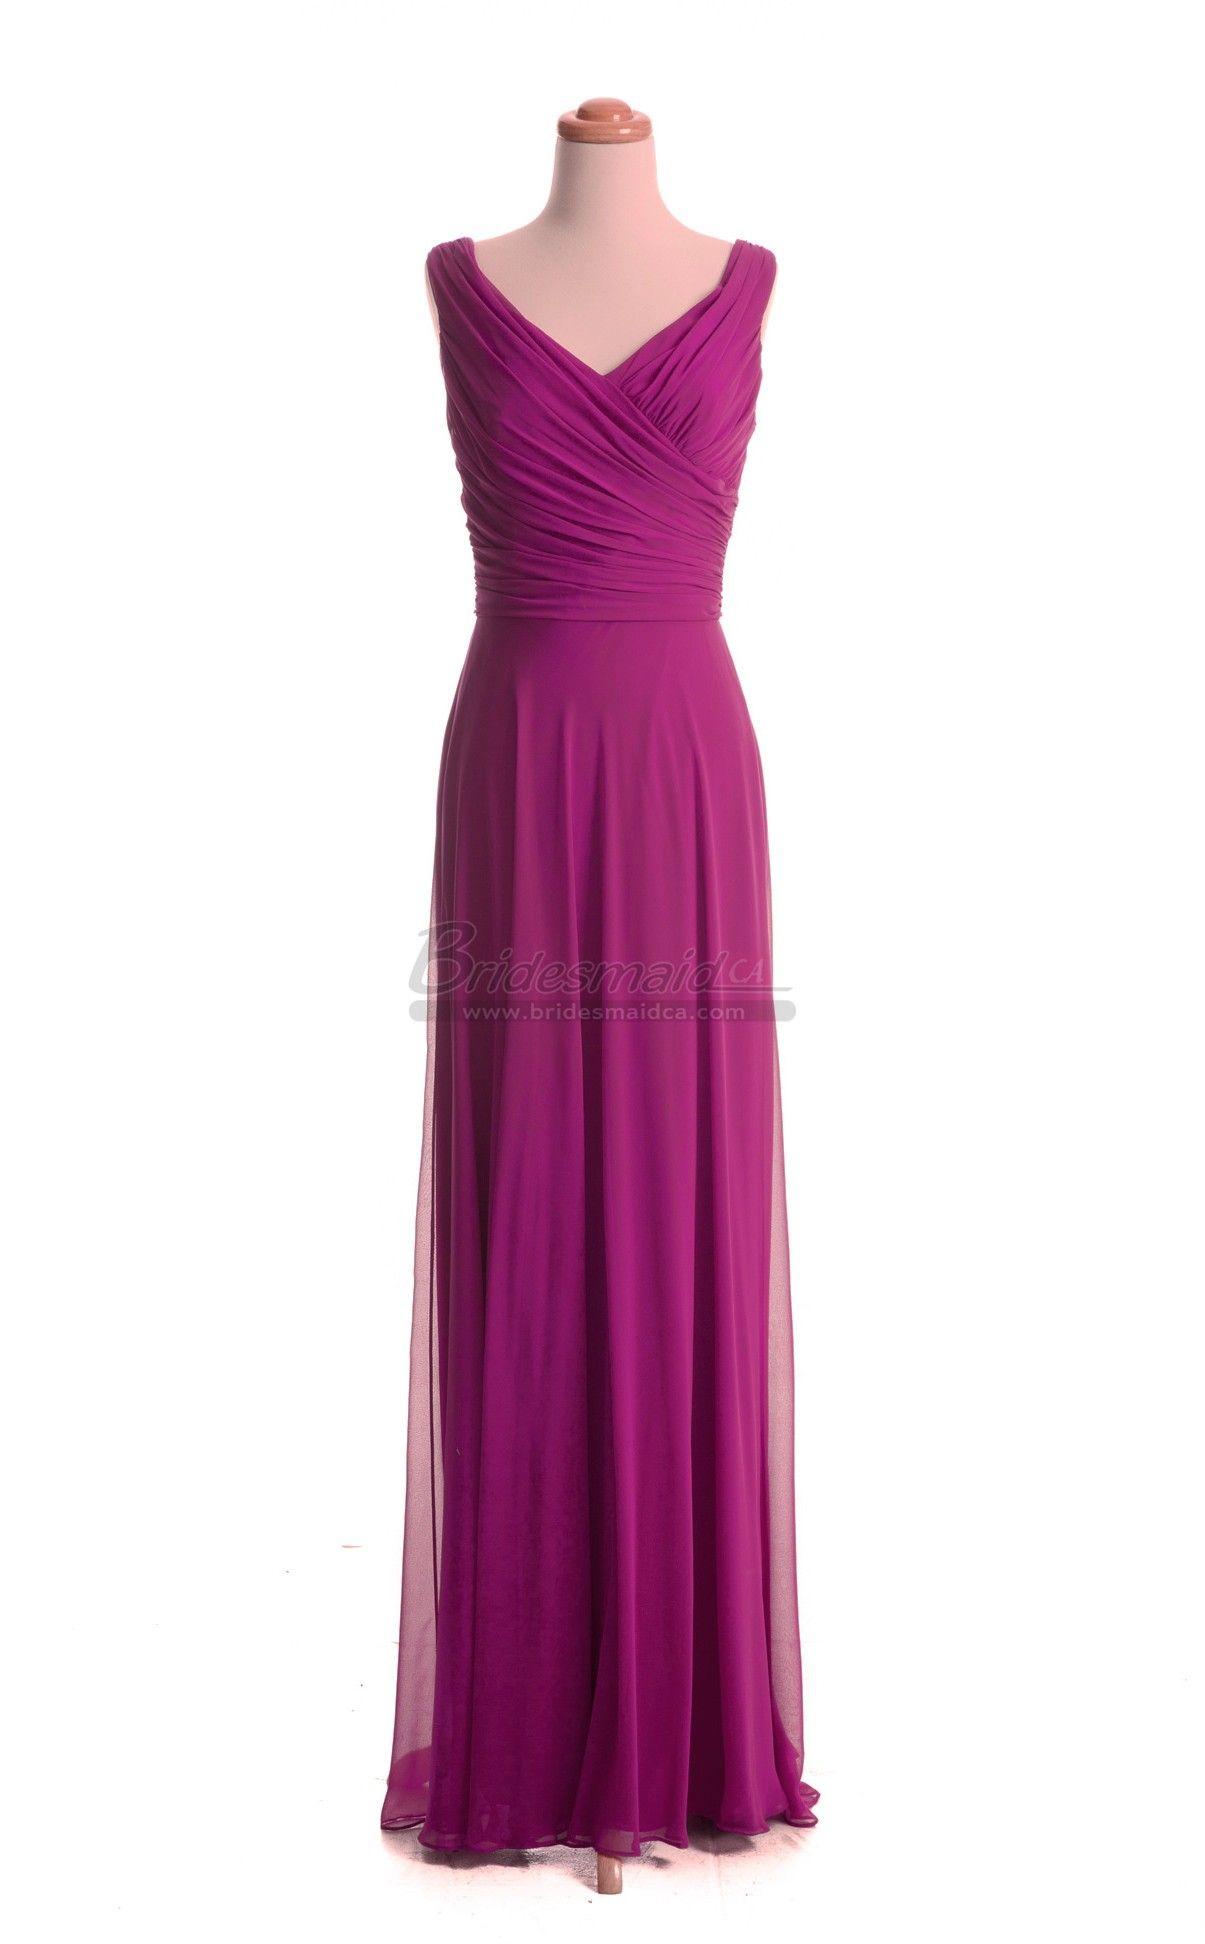 Chiffon V Neck Fuchsia Long Bridesmaid Dress in Purple Dresses BDS ...